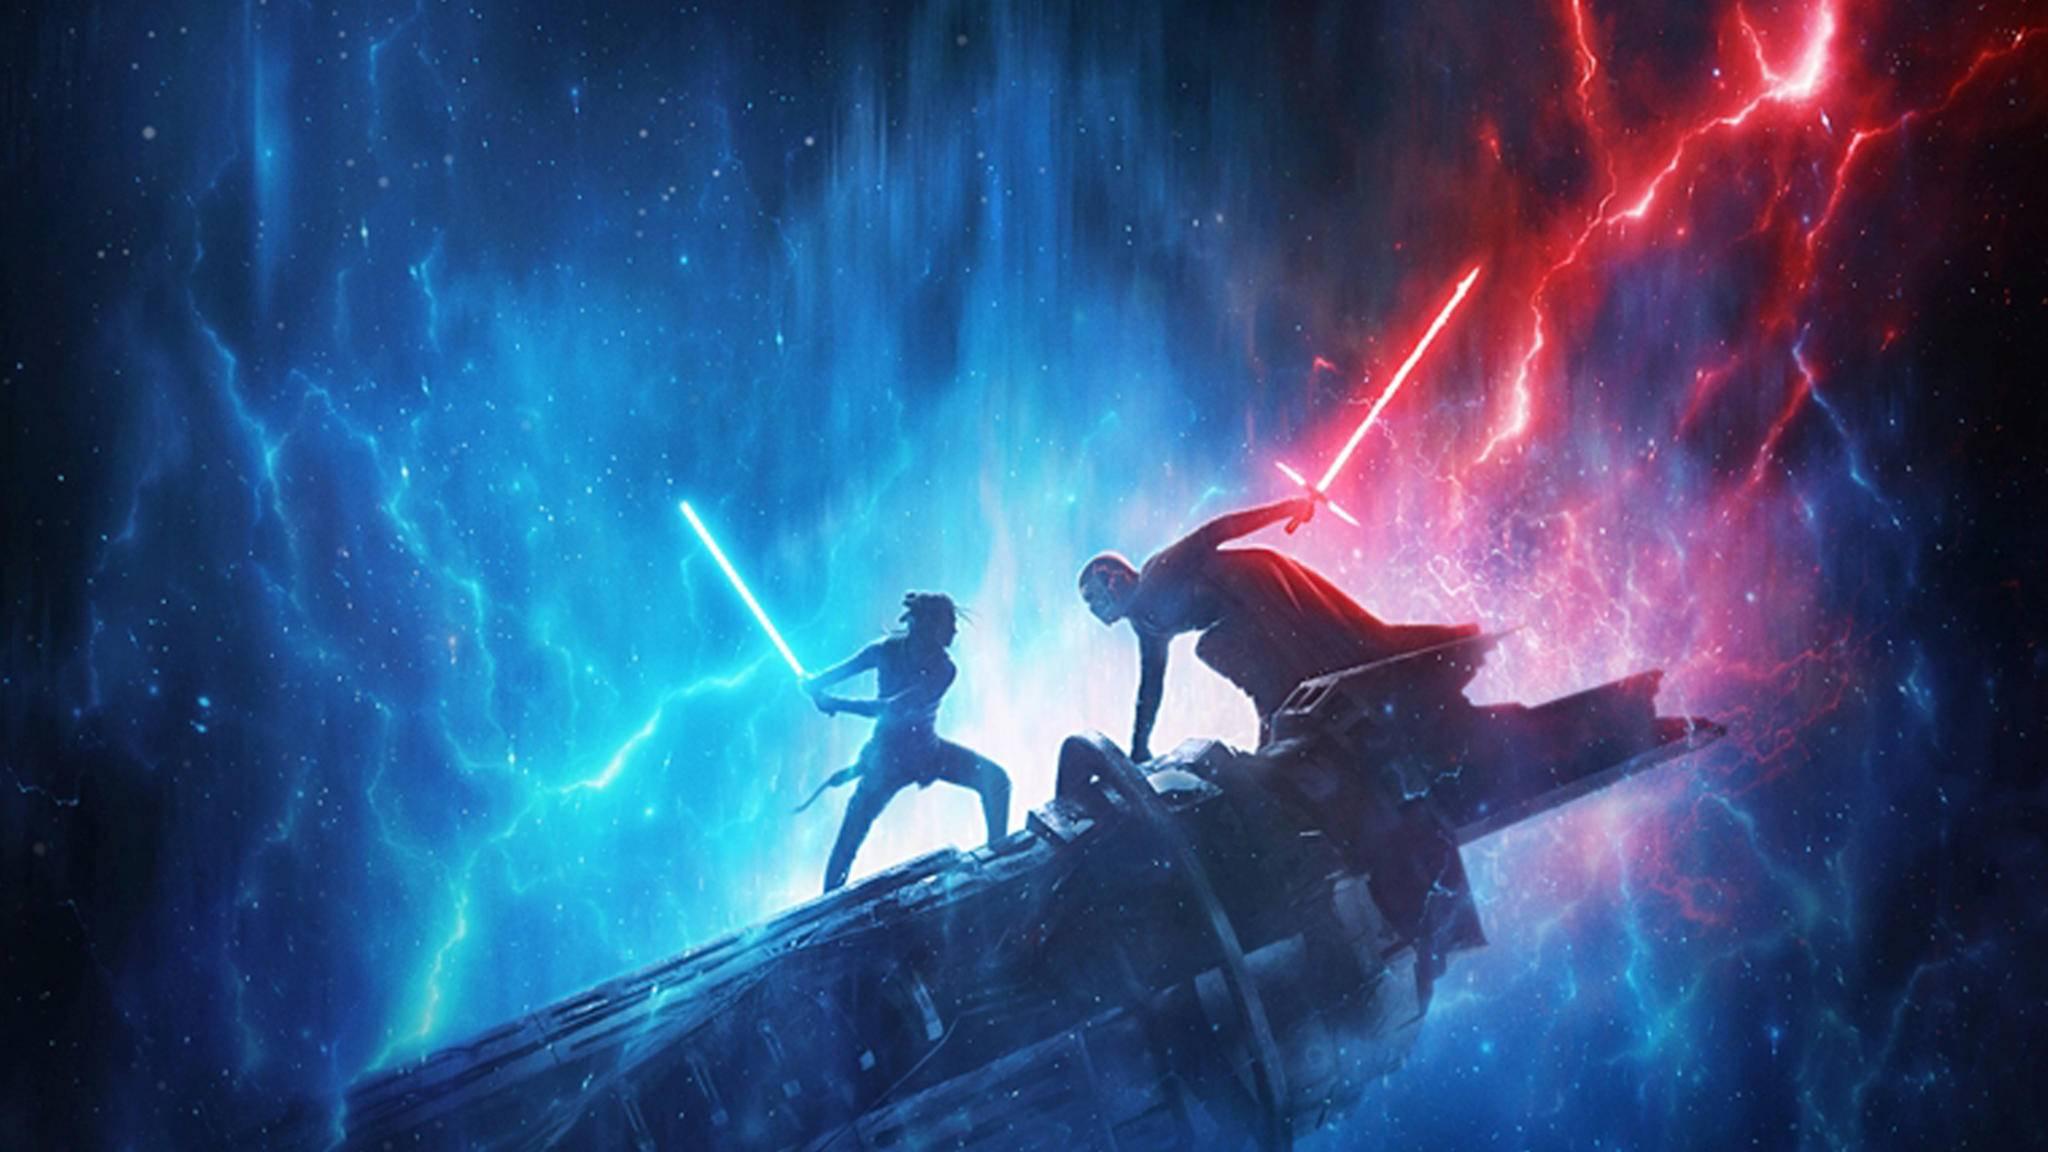 Star Wars Der Aufstieg Skywalkers-Teaserplakat-Poster-Walt Disney Studios